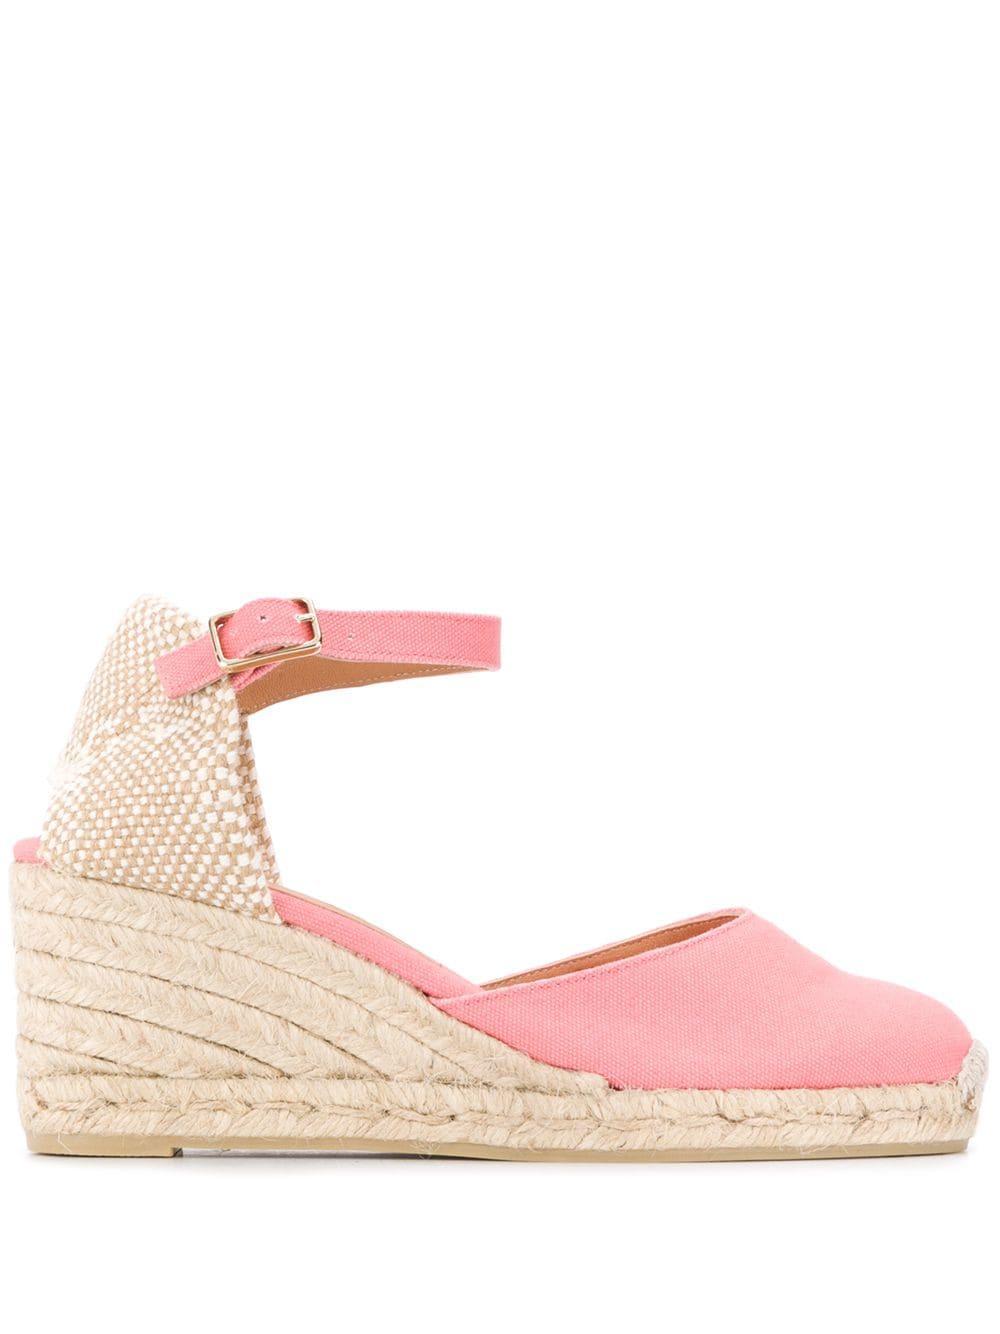 Ankle Strap Espadrille Wedge Sandal